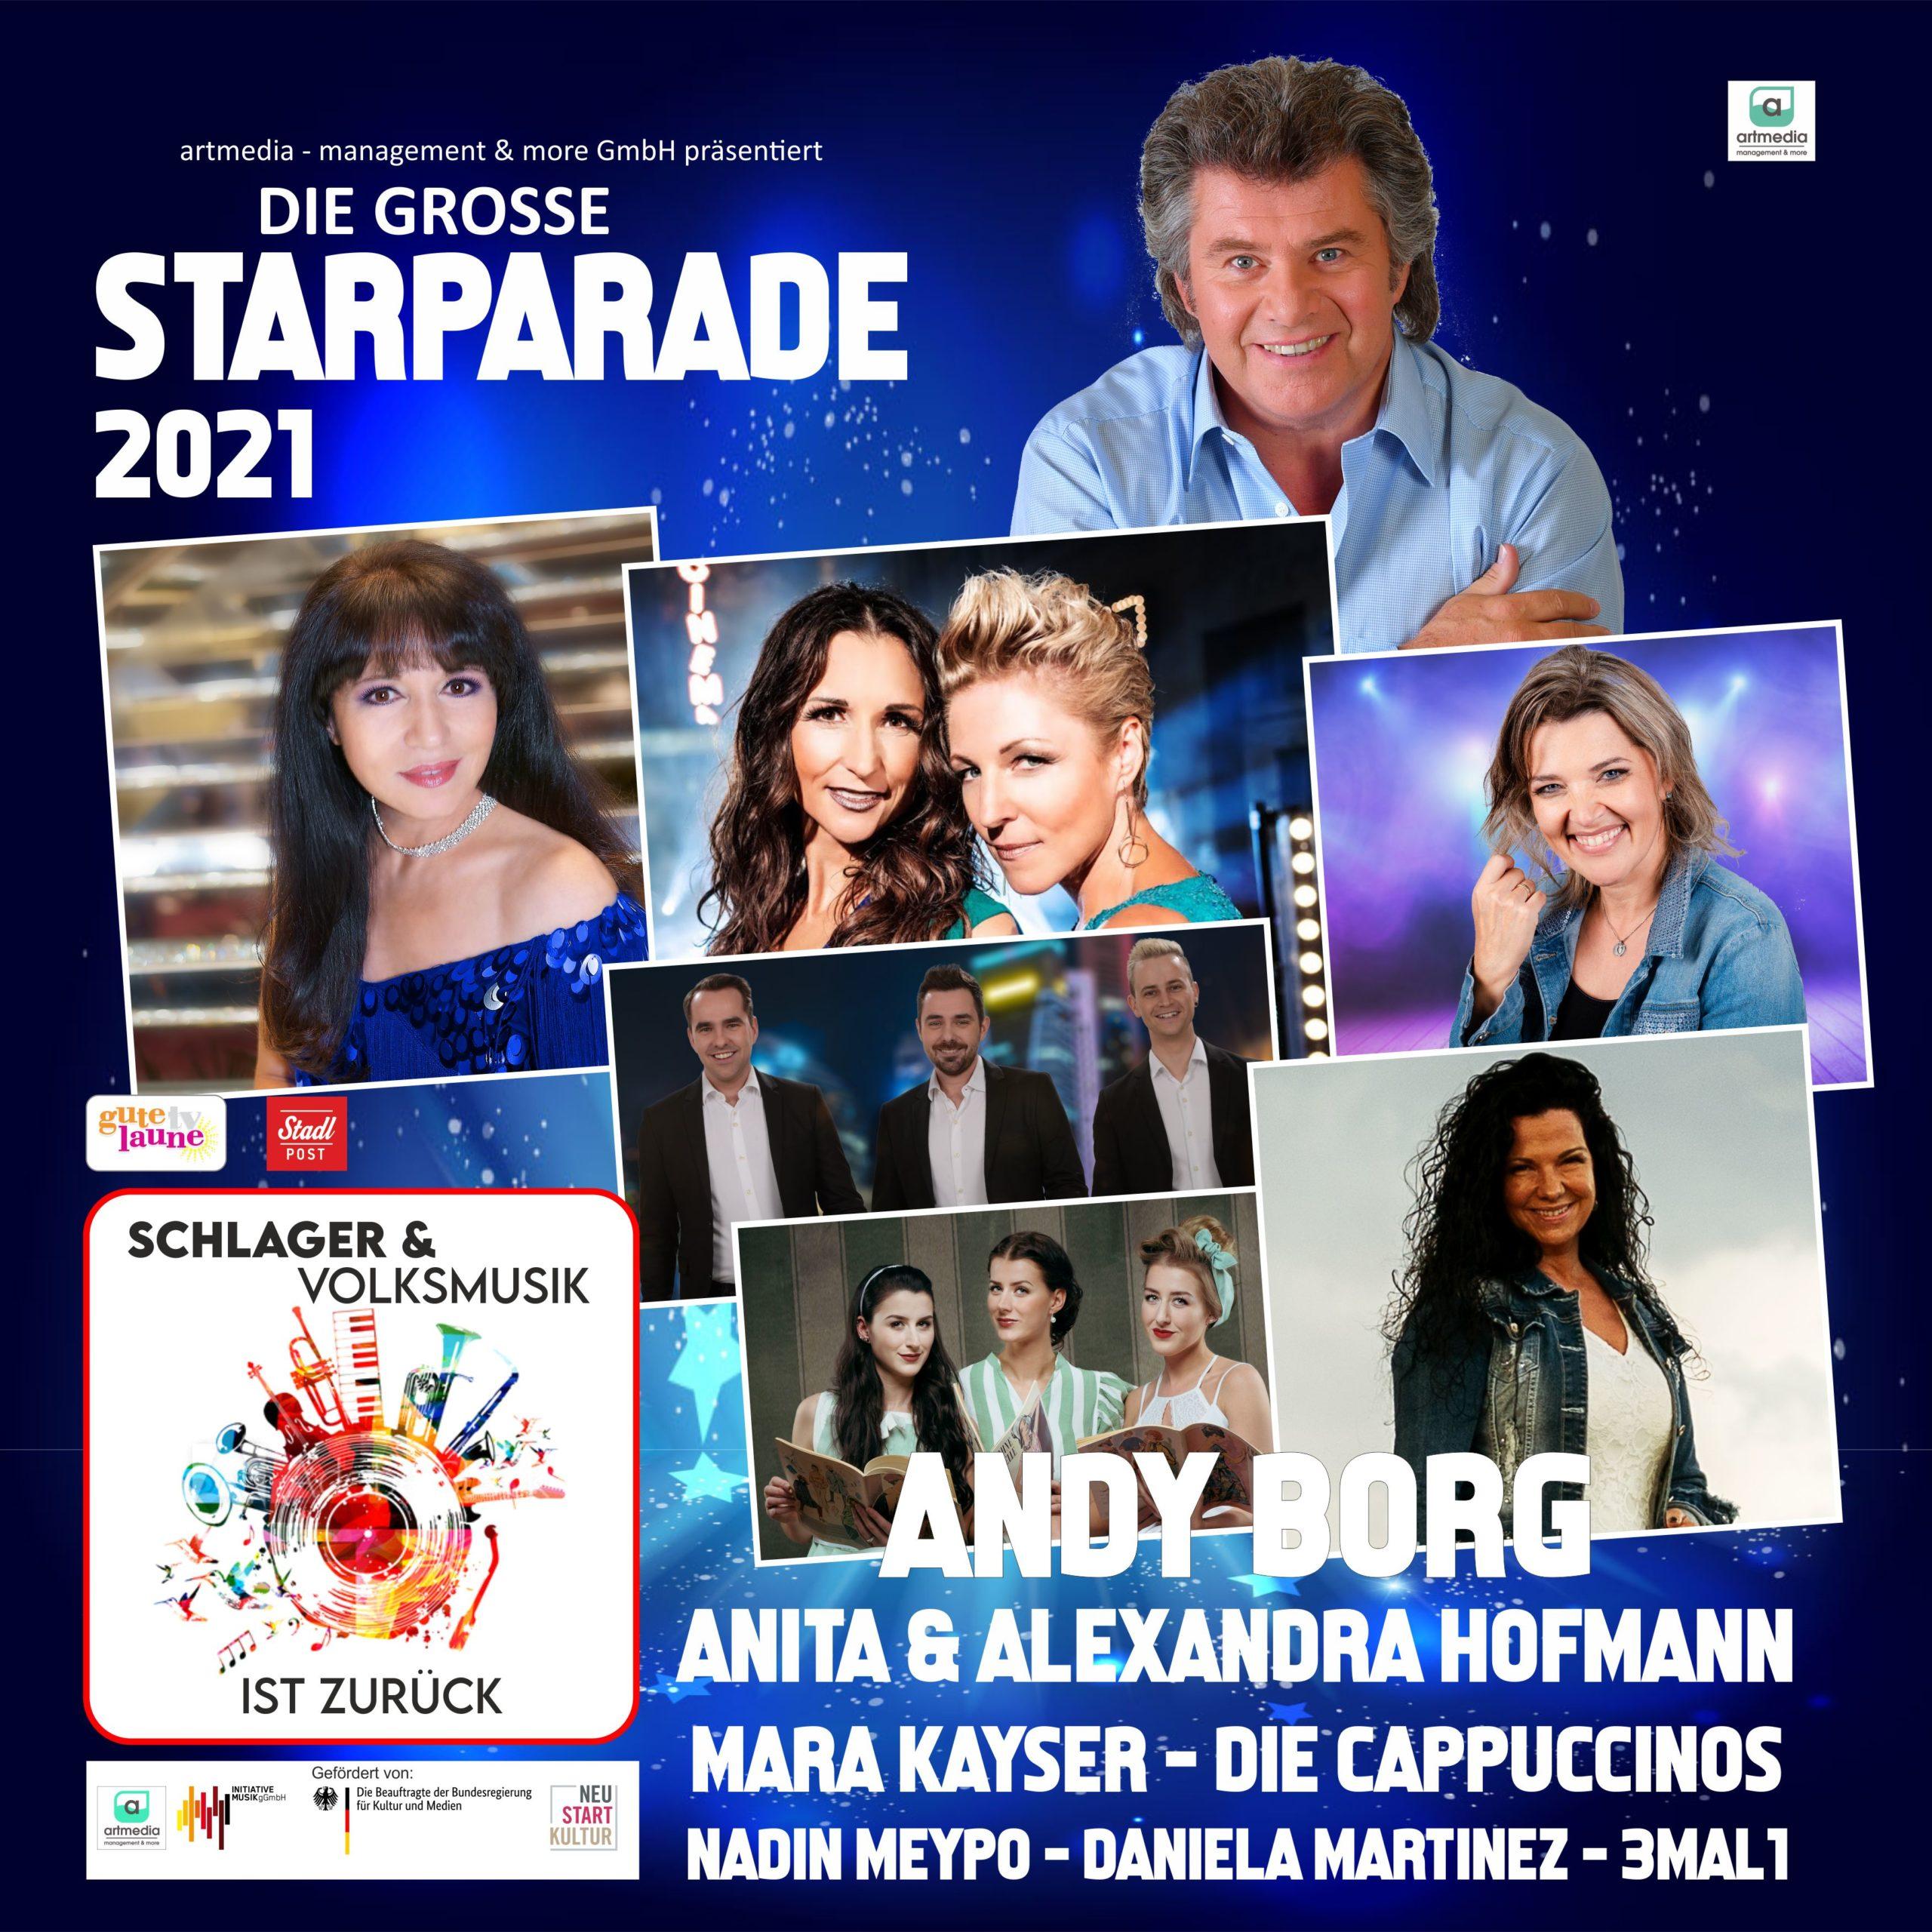 ANDY BORG, ANITA & ALEXANDRA HOFMANN, MARA KAYSER, DIE CAPPUCCINOS u.a. *Die große Starparade 2021 (Event-Reihe der artmedia - management & more GmbH)